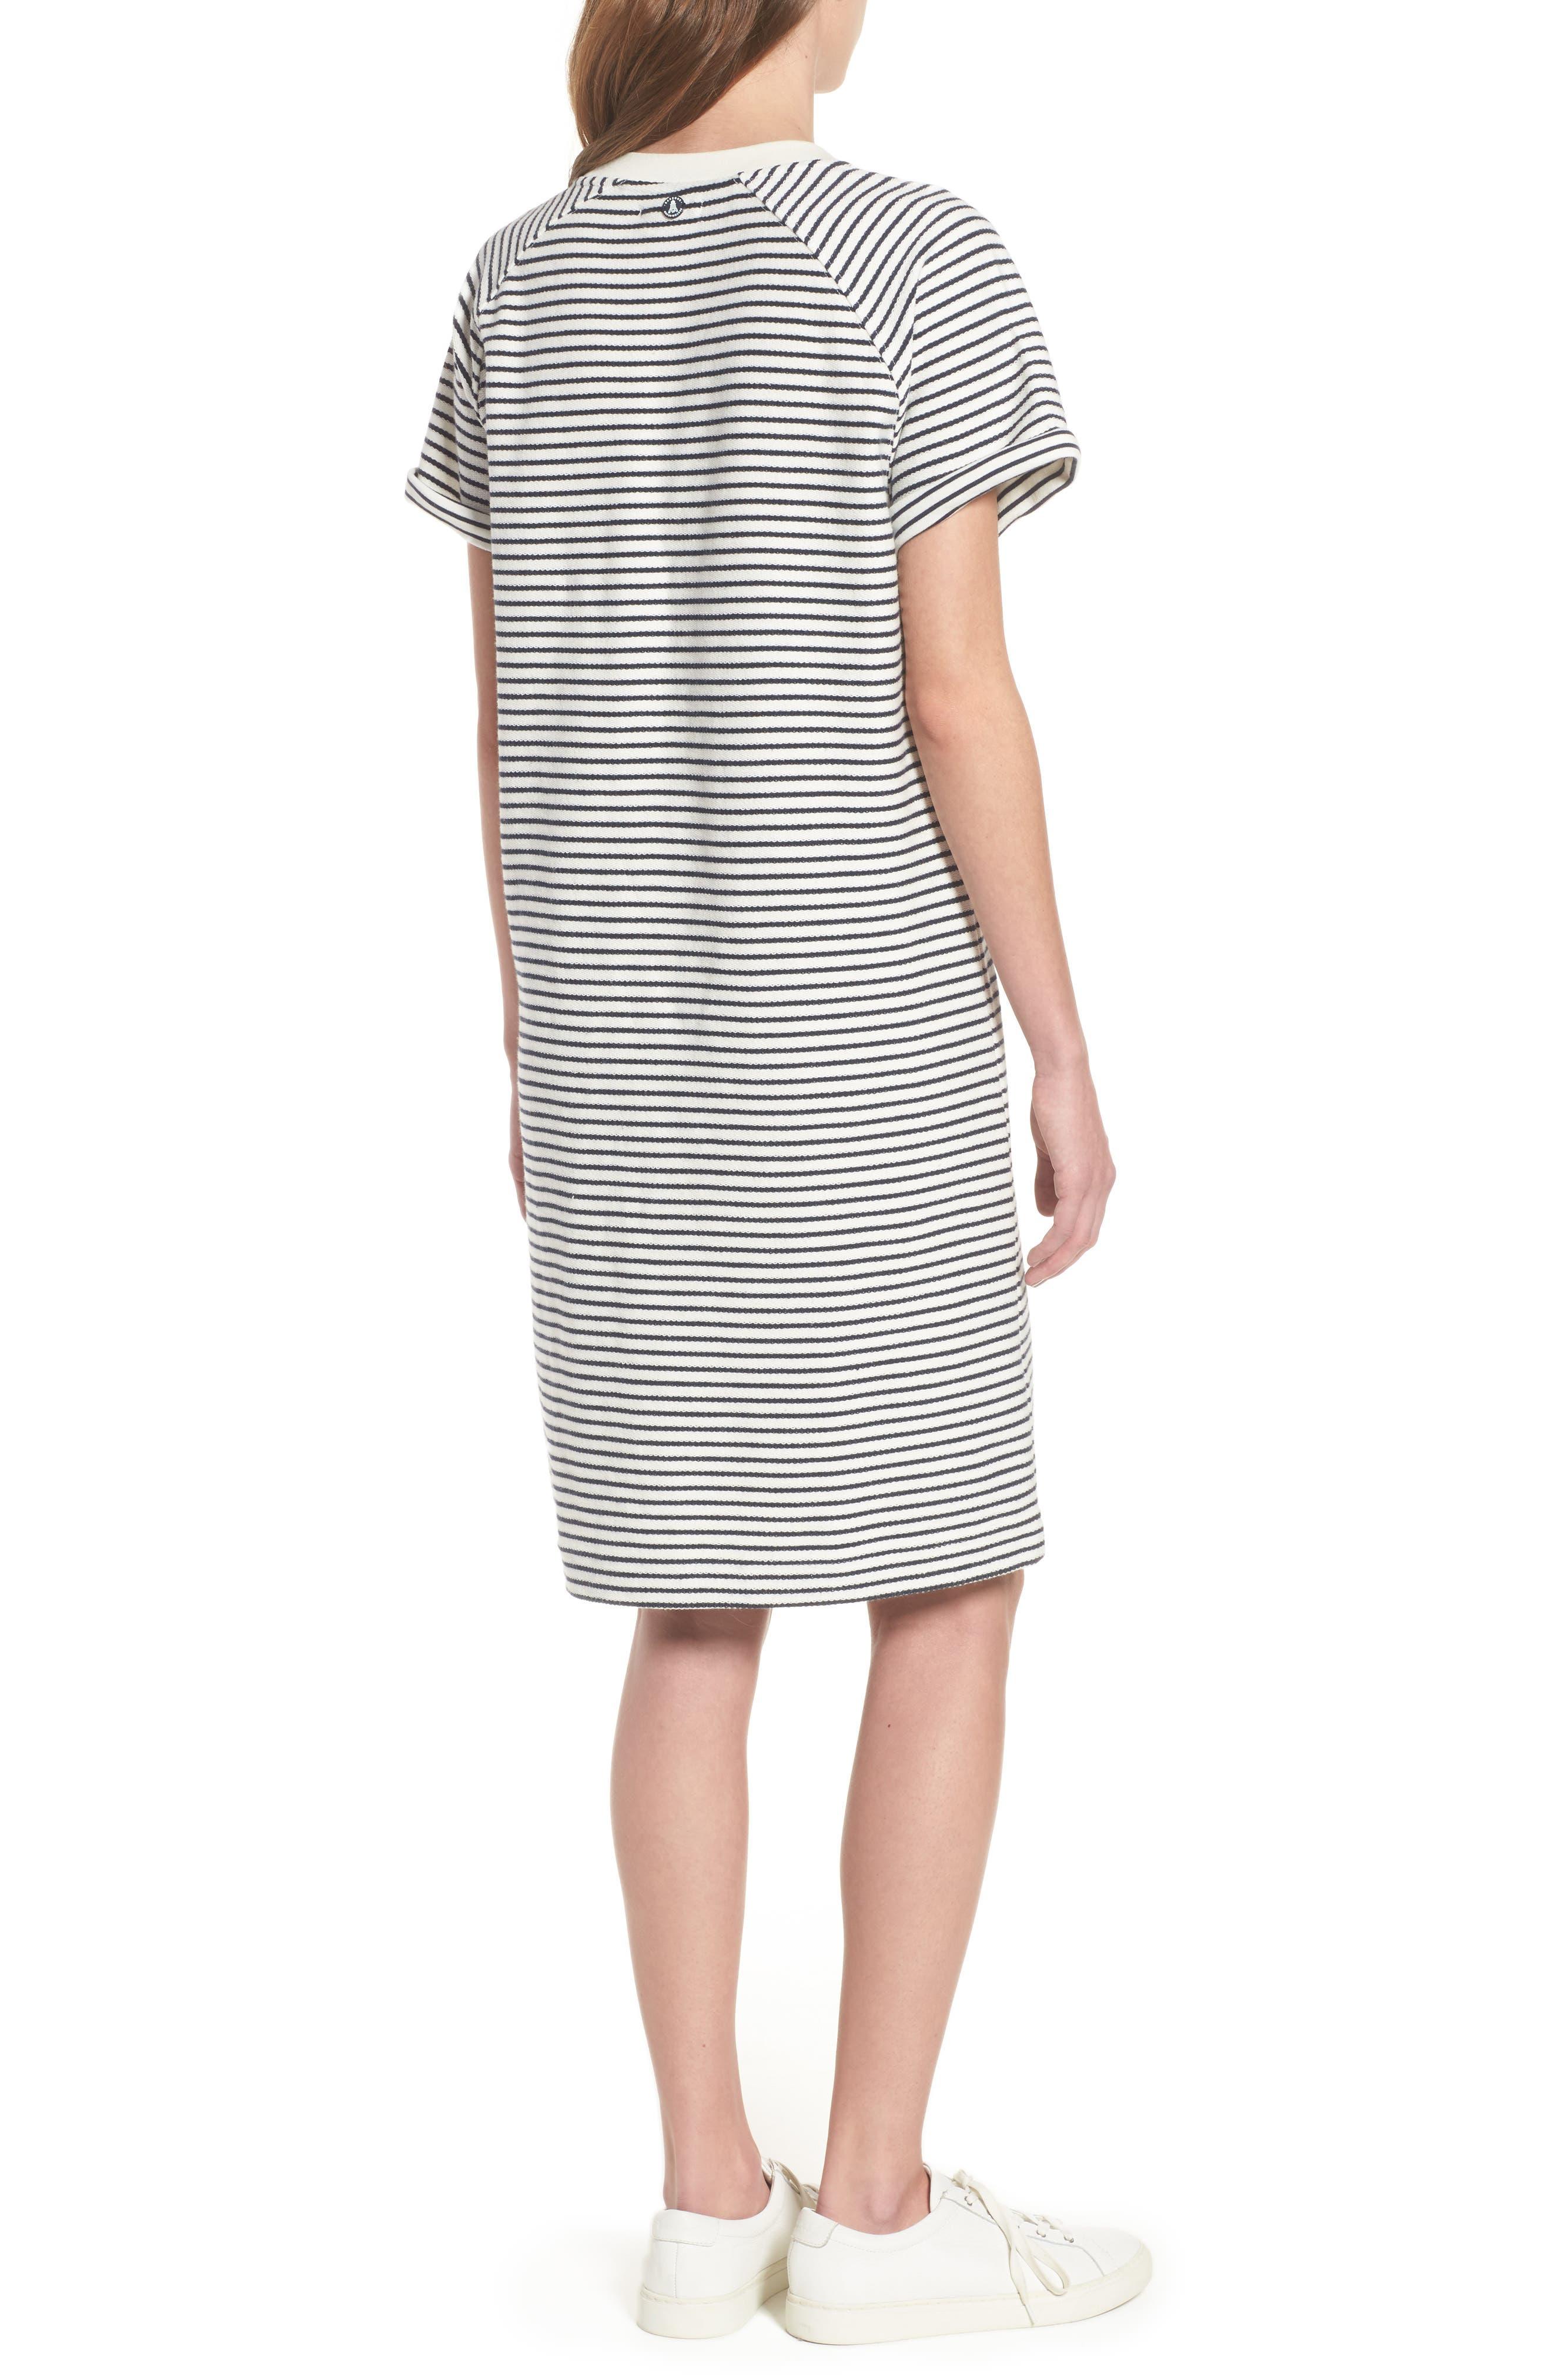 Monreith Stripe Shift Dress,                             Alternate thumbnail 2, color,                             White/ Navy